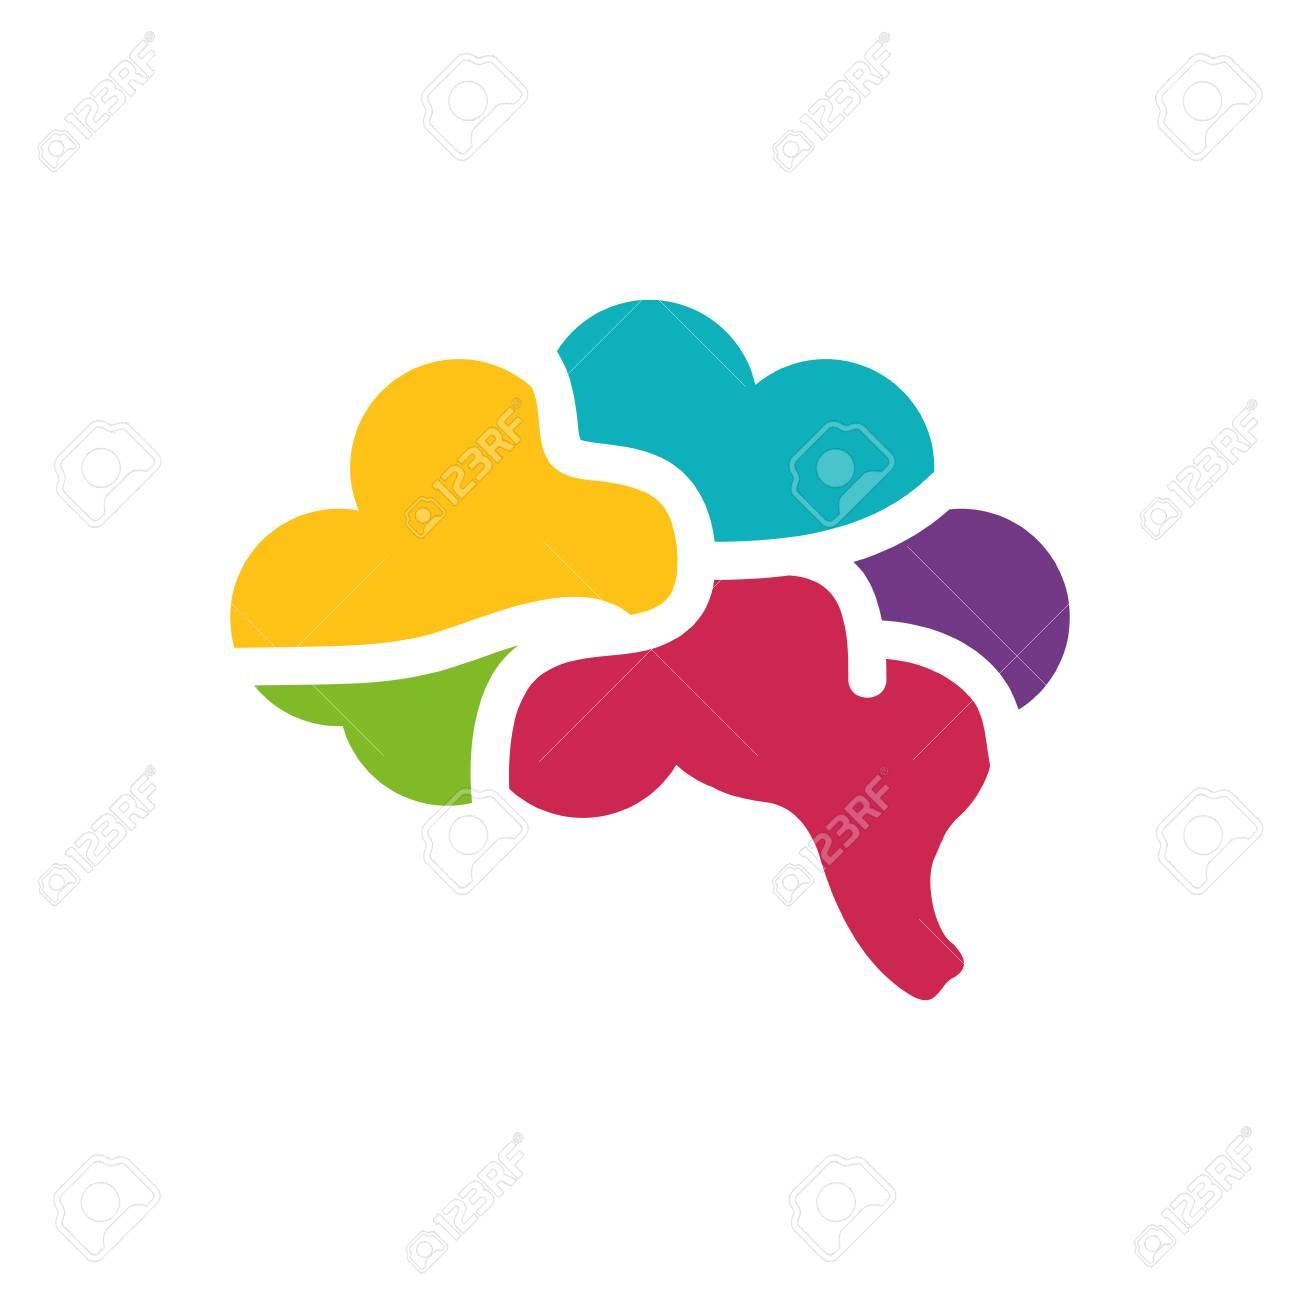 Human brain symbol icon vector illustration graphic design royalty human brain symbol icon vector illustration graphic design stock vector 72263728 biocorpaavc Images